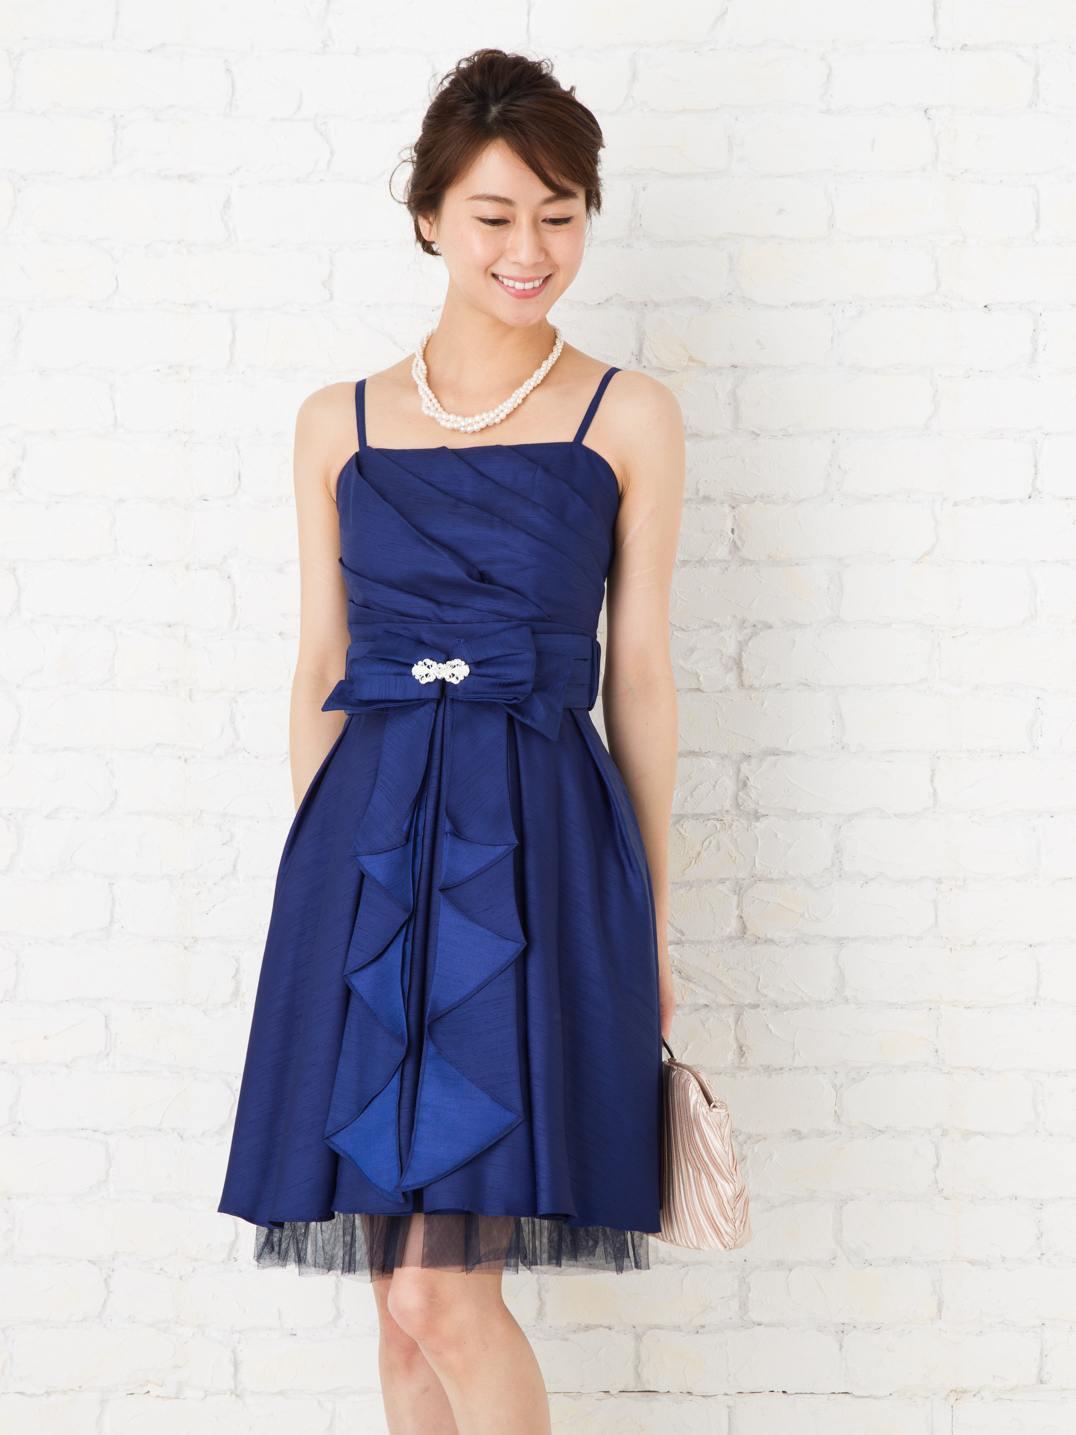 RYK ドレス / Mサイズ (DOC0010)